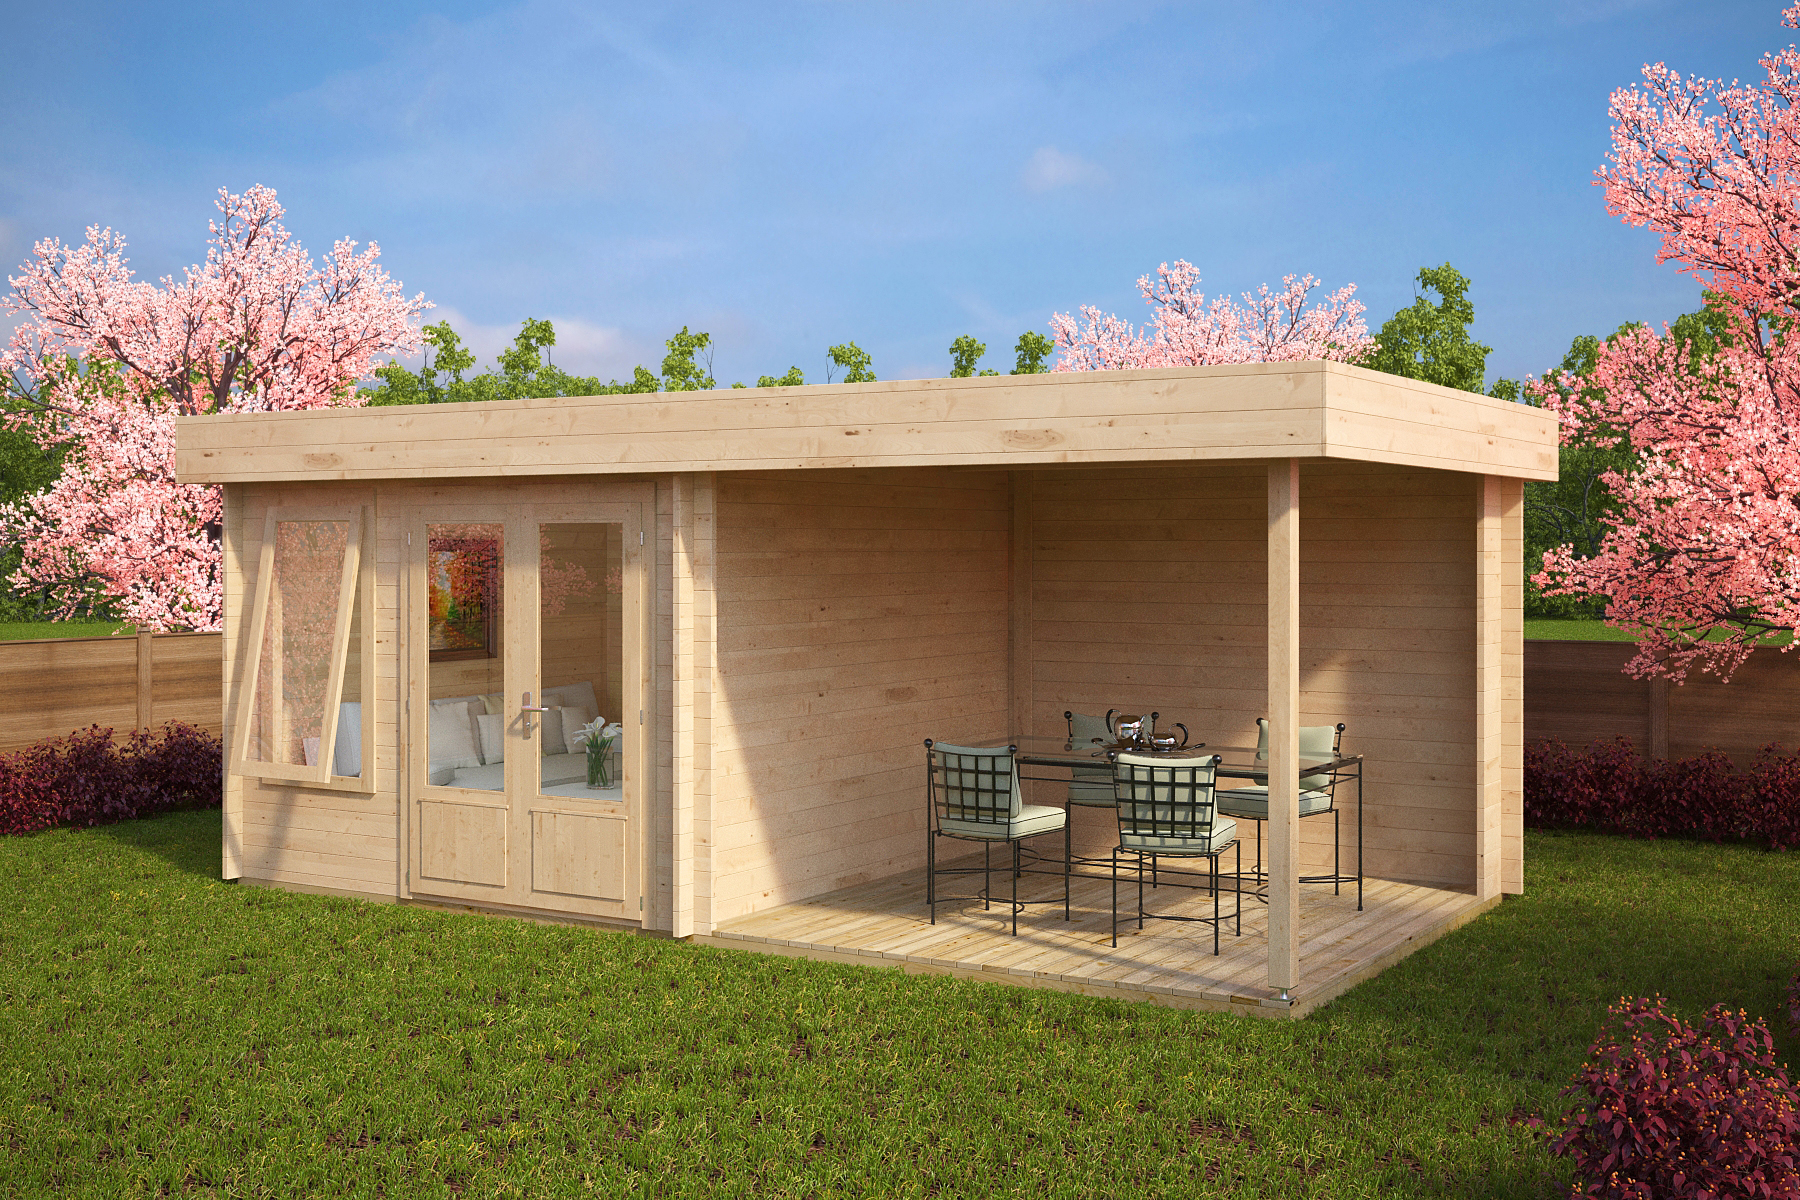 Garden Room Lucas D with veranda 9m² / 6 x 3 m / 44mm